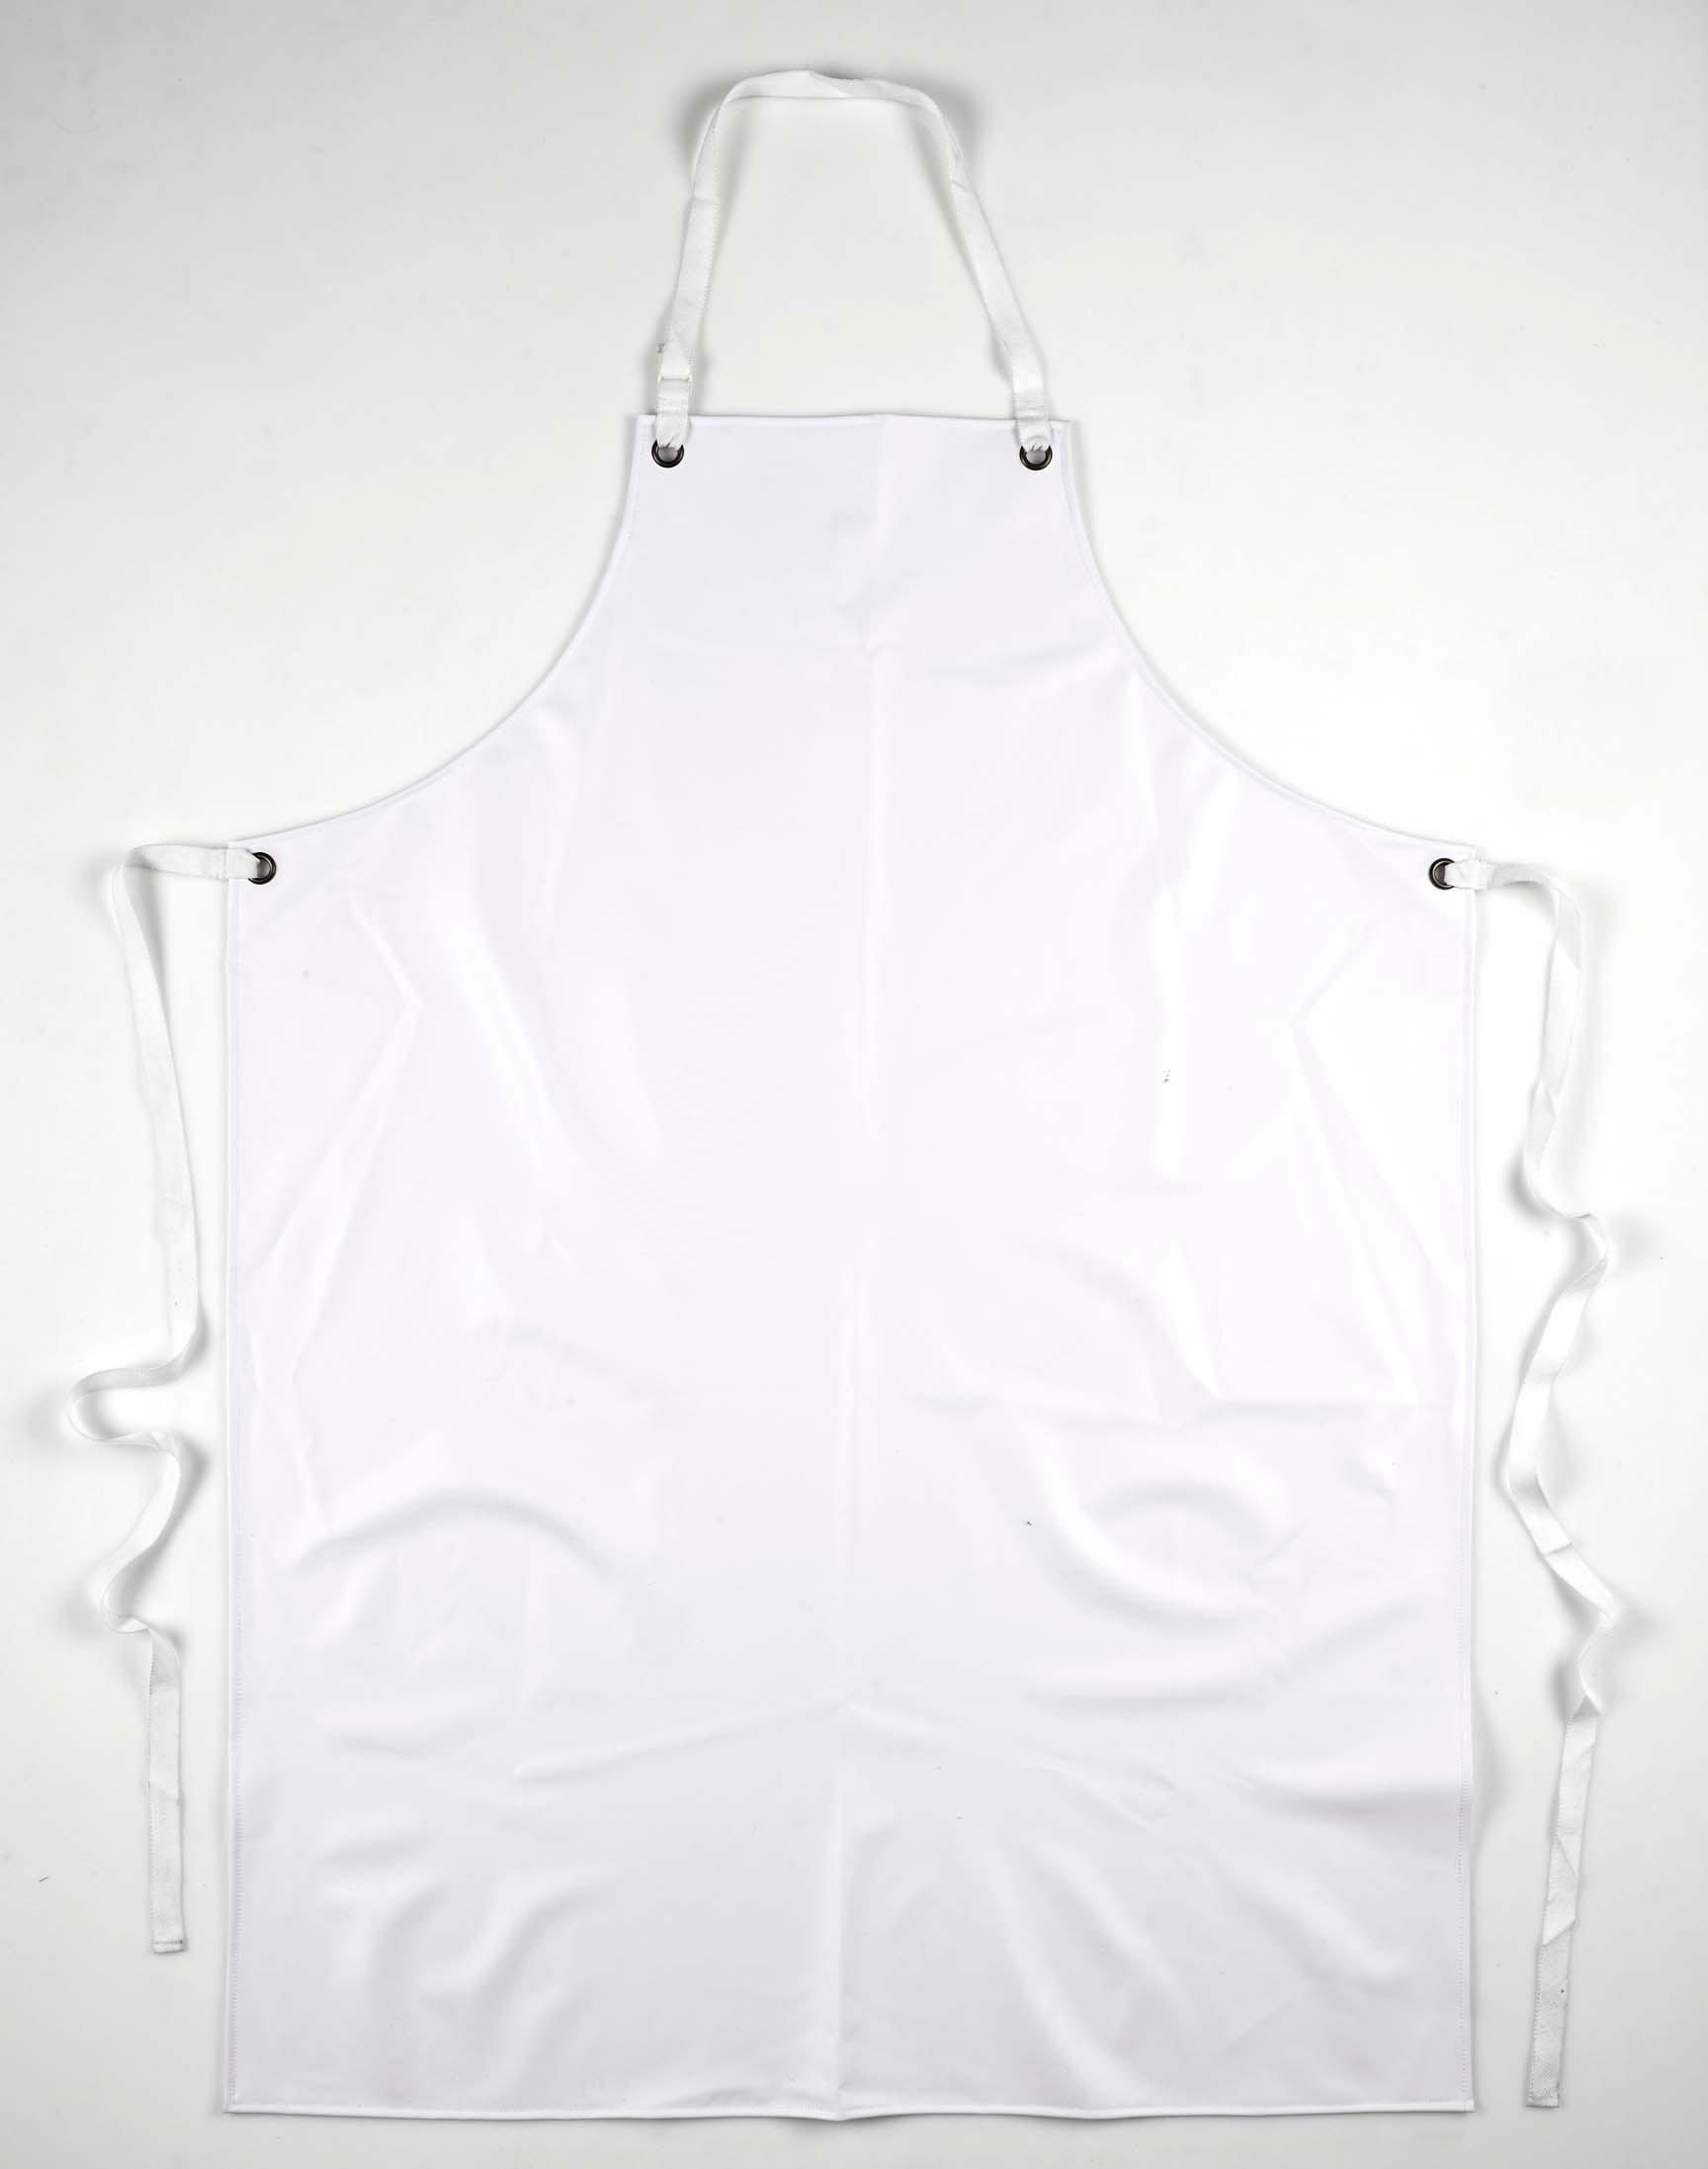 White apron brisbane - Previous Next